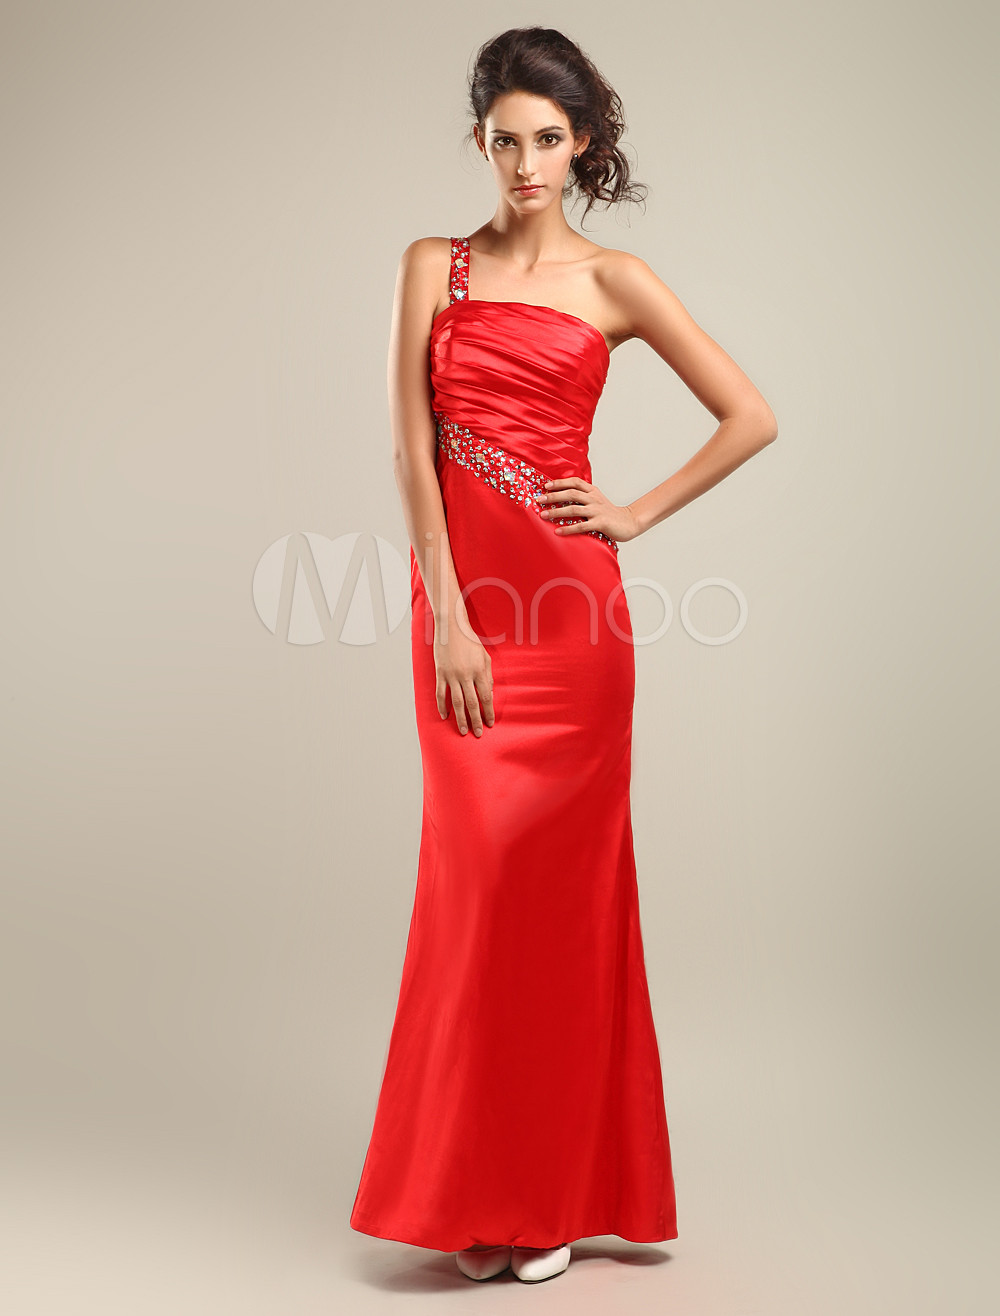 Elegant Slim Red Silk Like Satin One Shoulder Prom Dress (Wedding Prom Dresses) photo